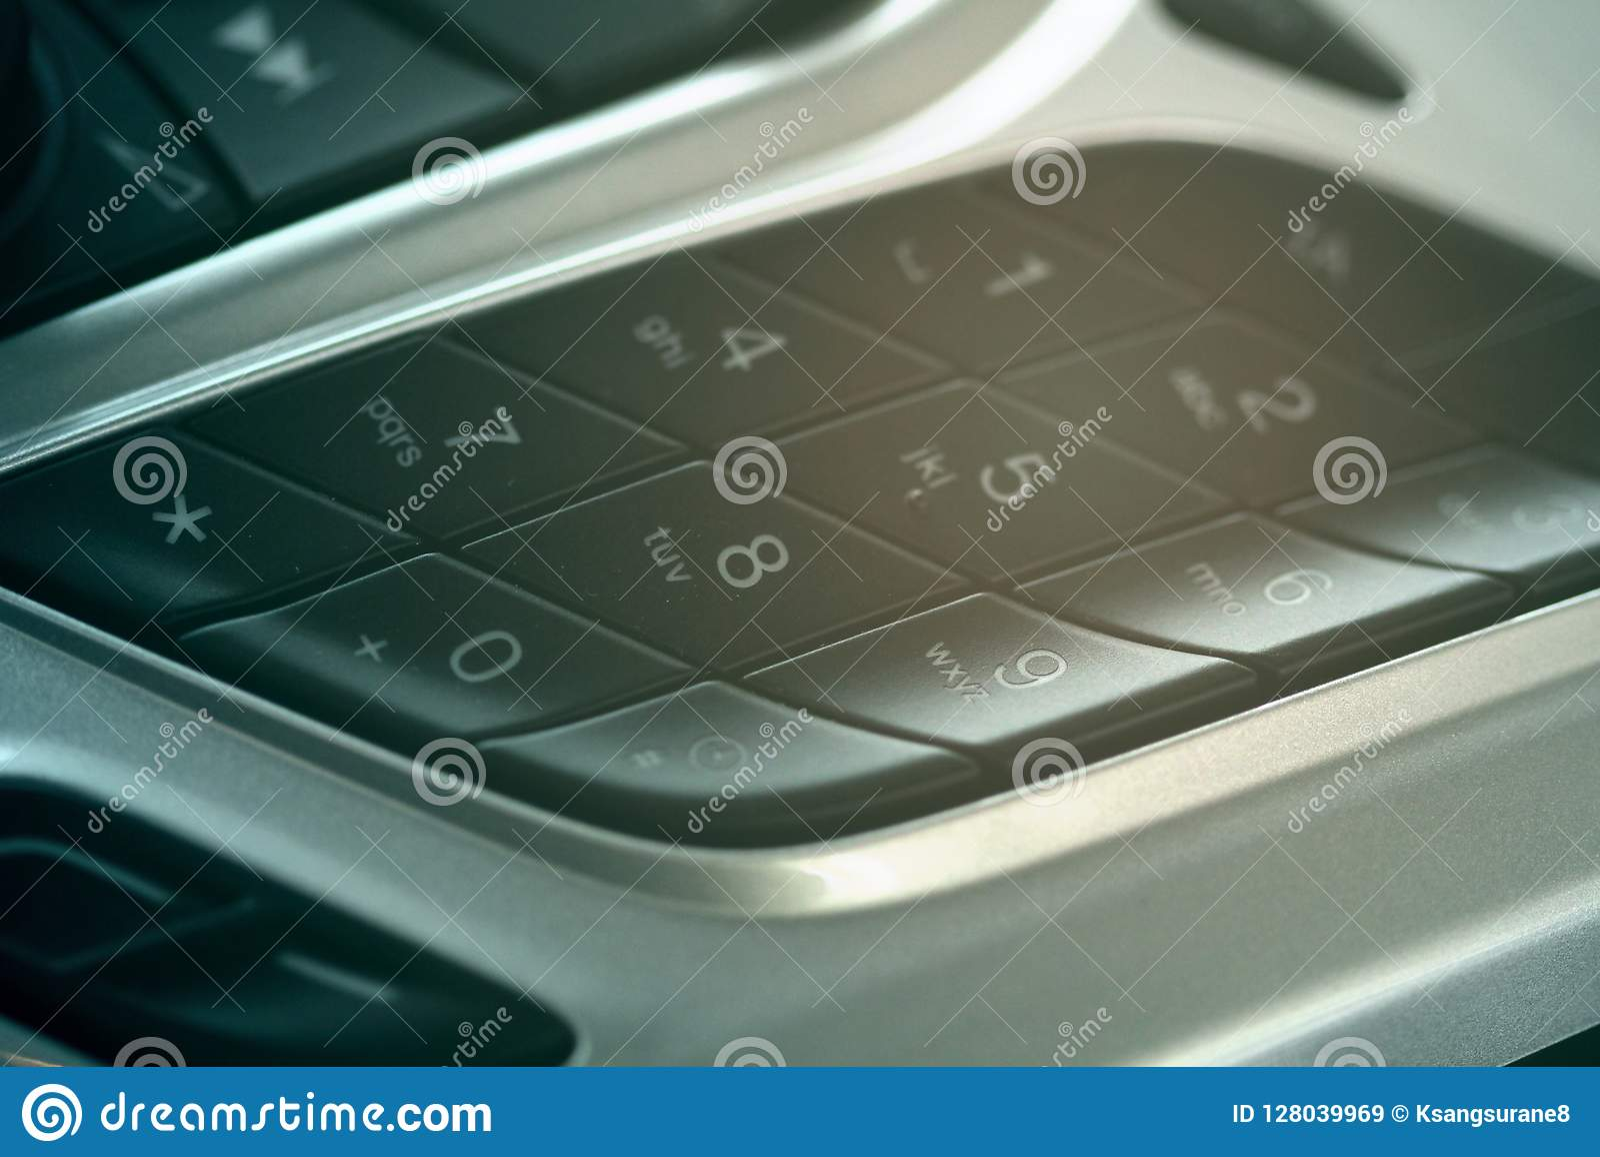 A almofada do seletor do painel do carro ao lado do controle audio abotoa-se